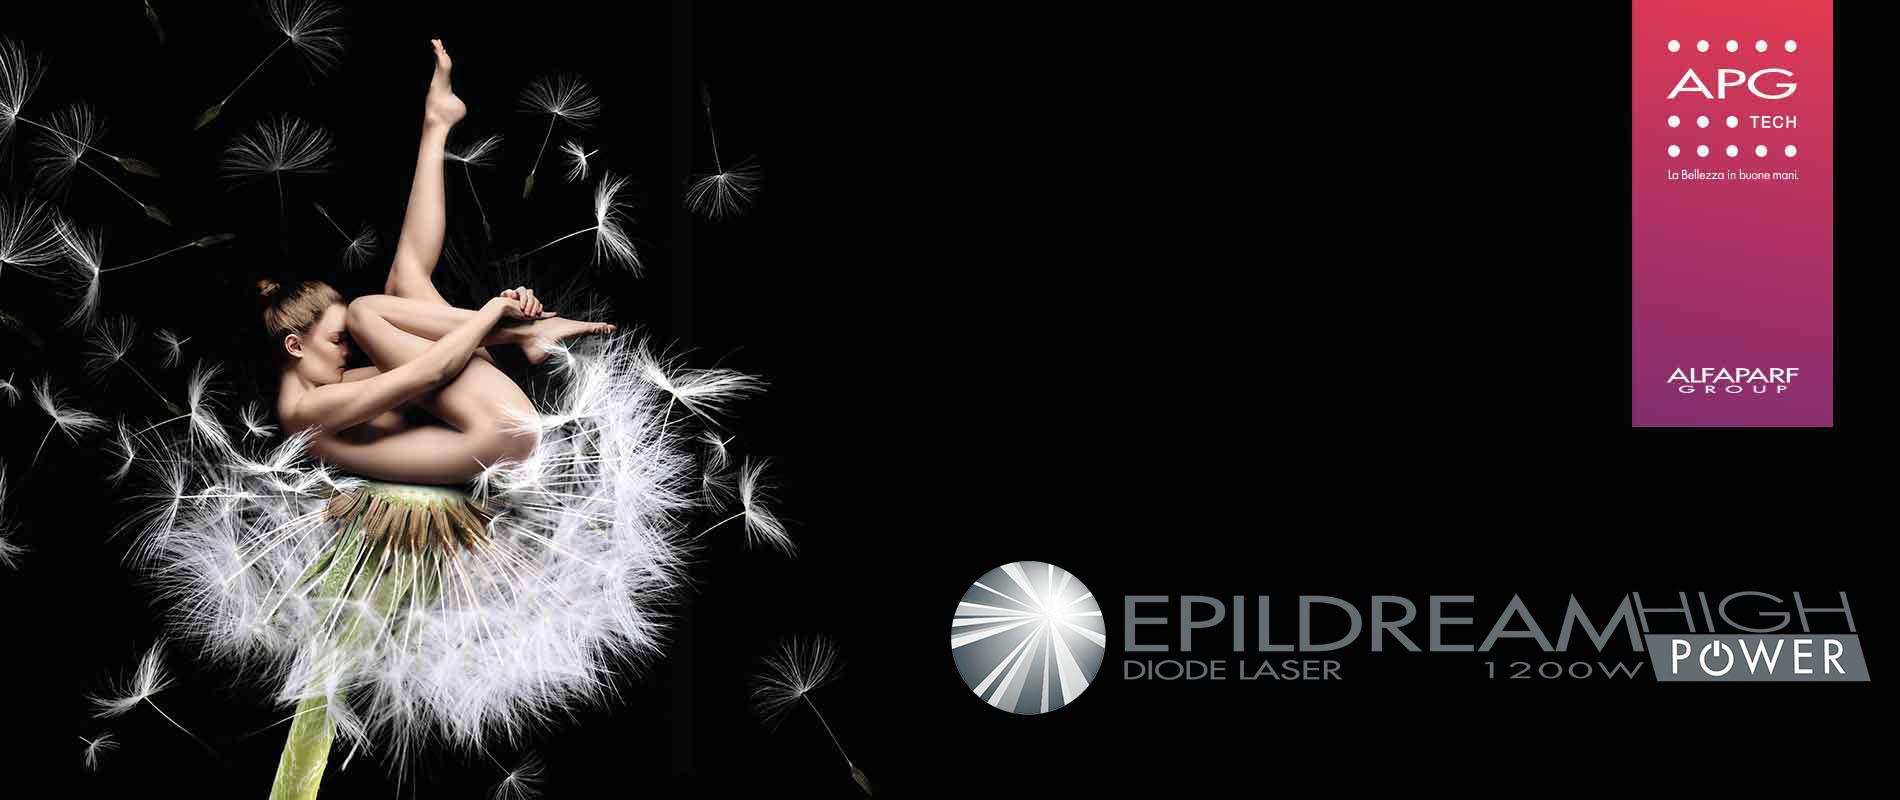 Epildream High Power